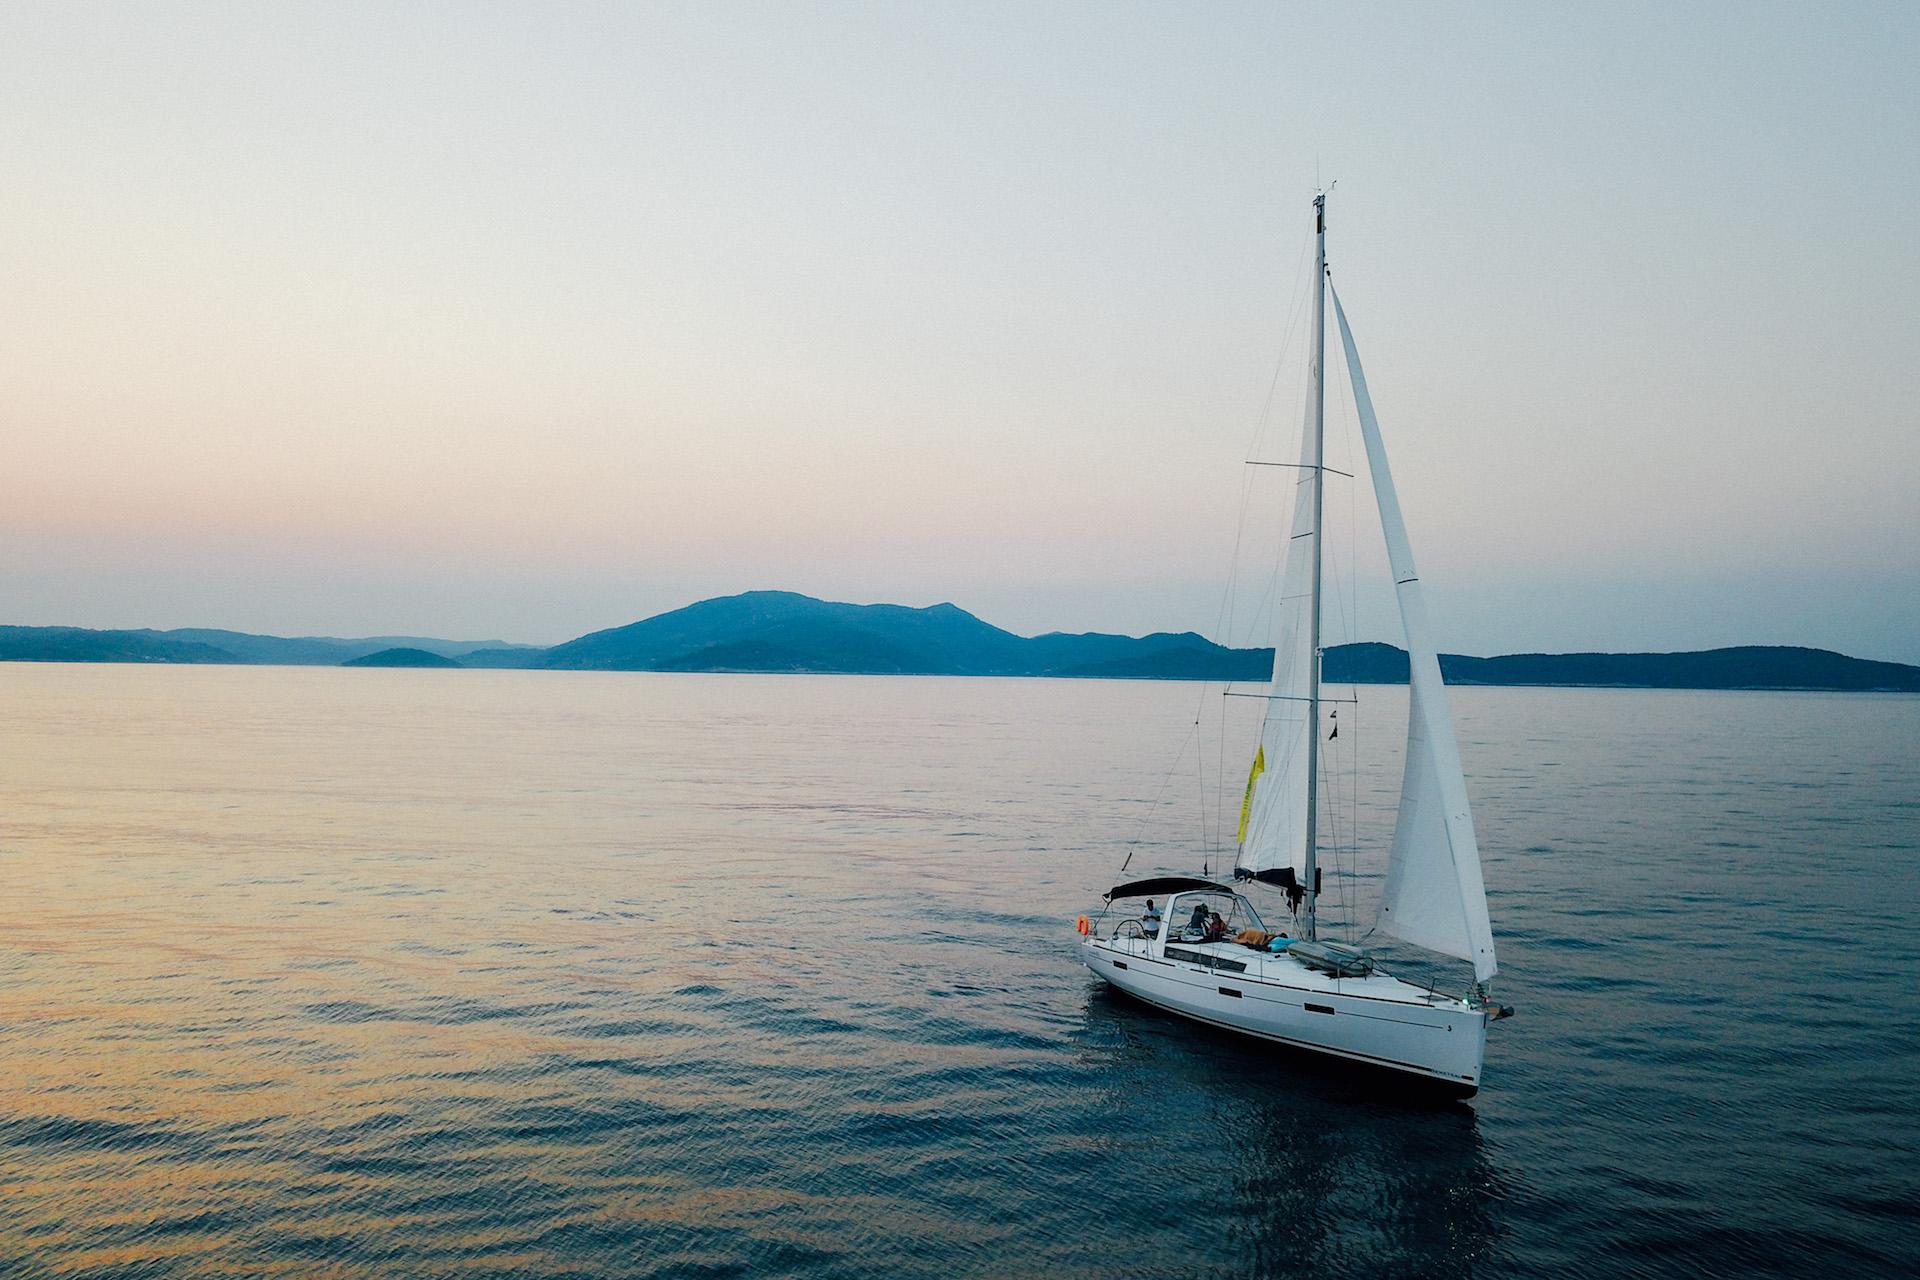 Segelurlaub in Kroatien für Singles - ibt-pep.de